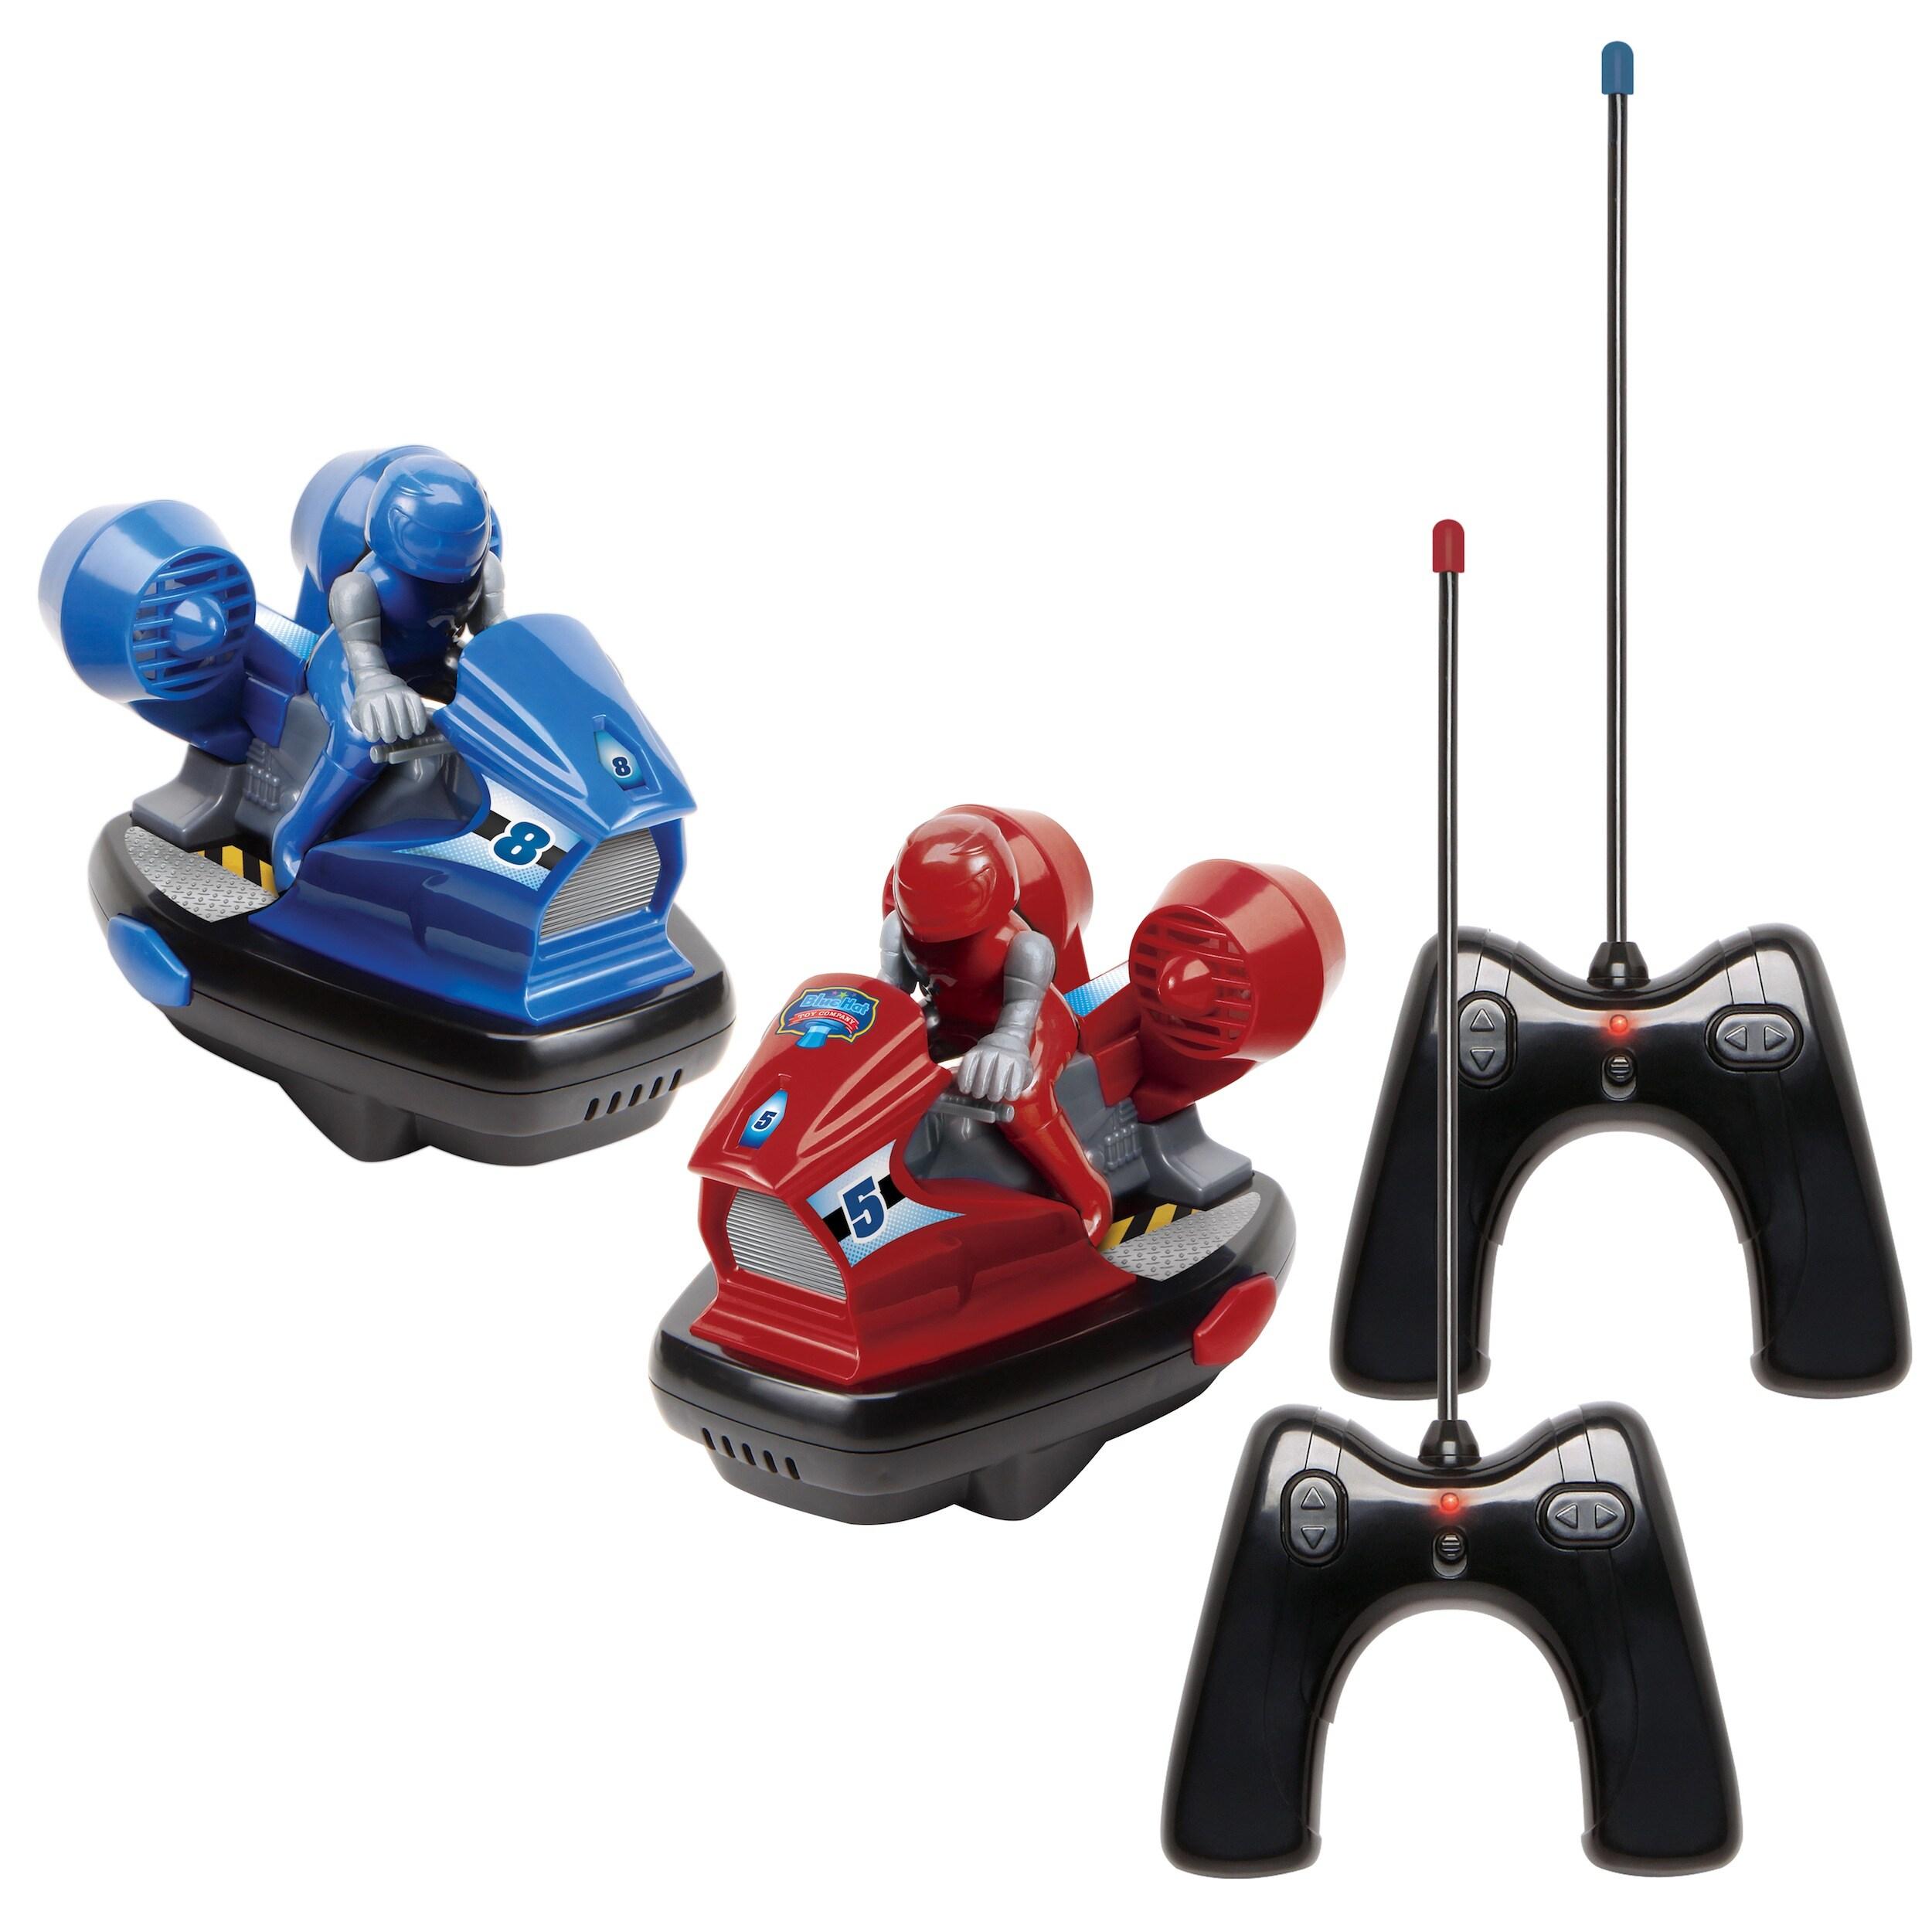 Black Series Remote Control Bumper Cars